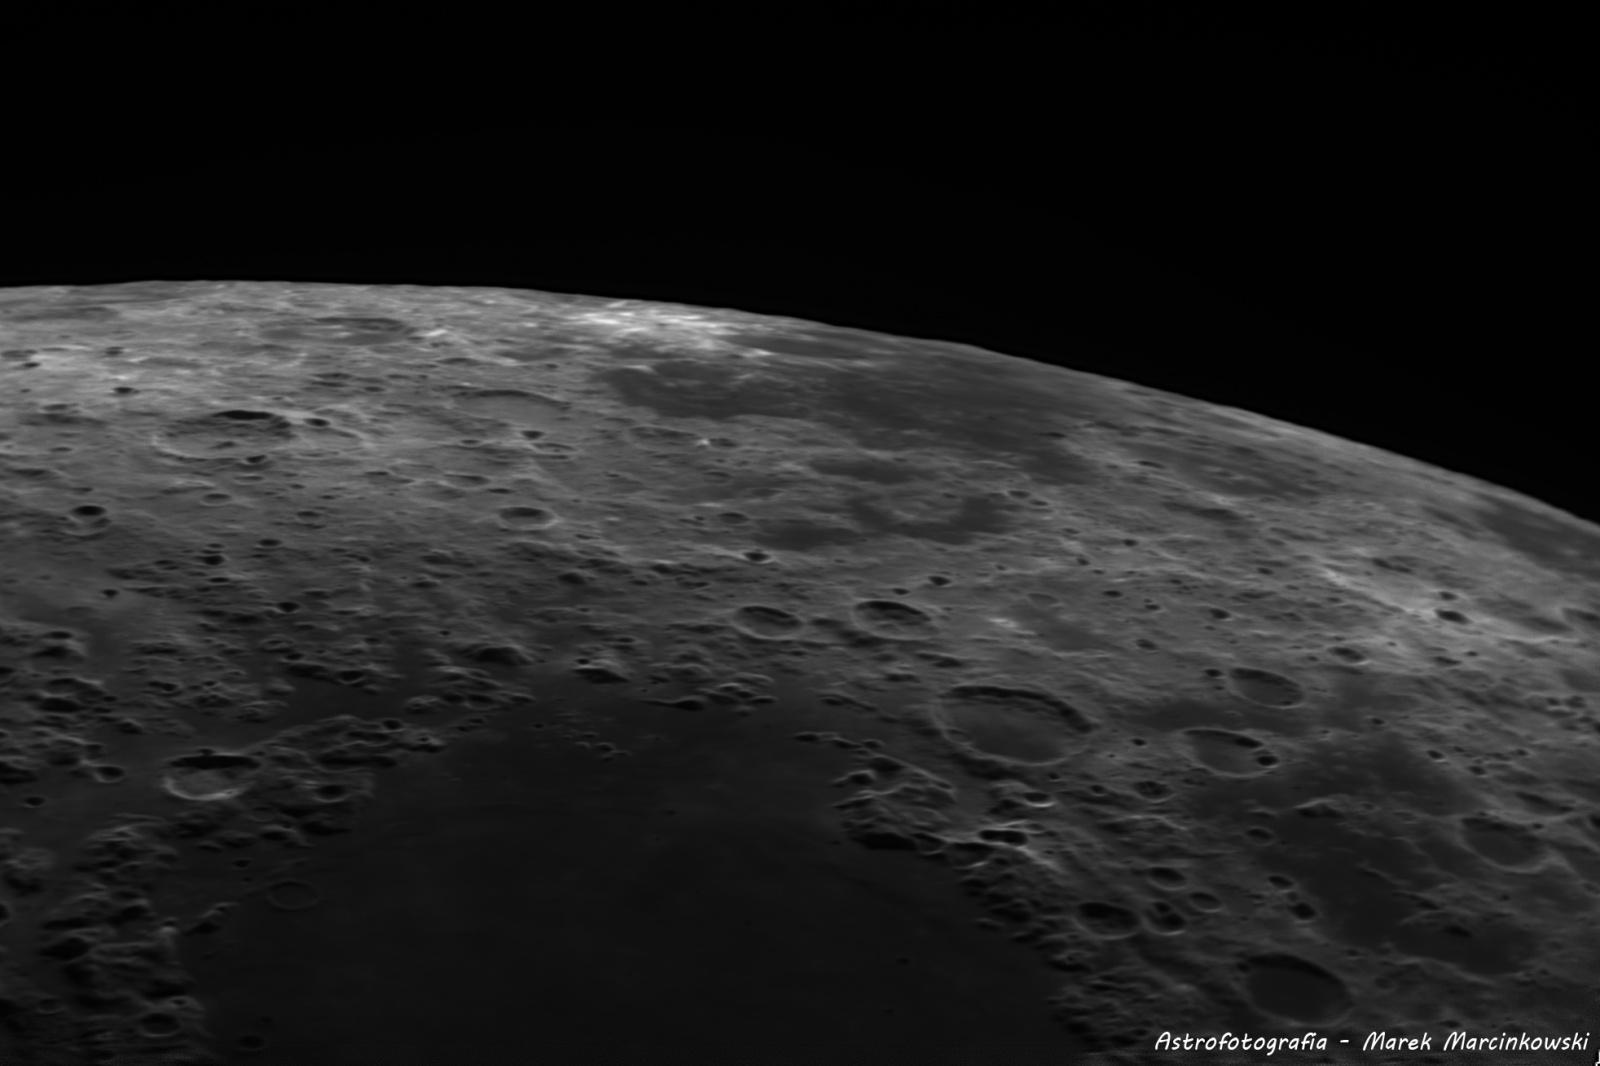 2021-01-17-1615_6-Moon_lapl4_ap415_conv_PANO_FB.jpg